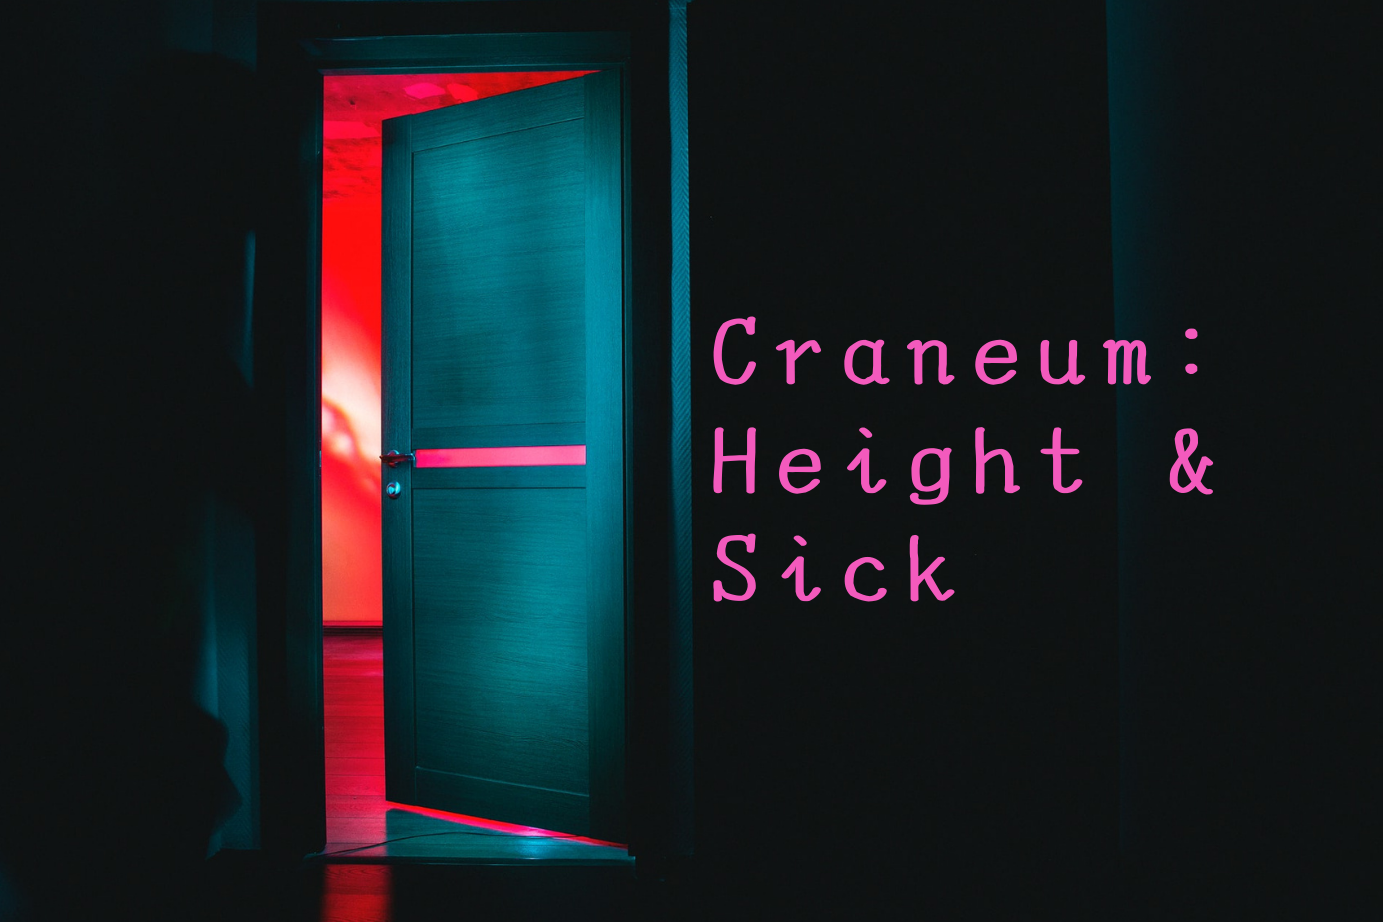 Height & Sick